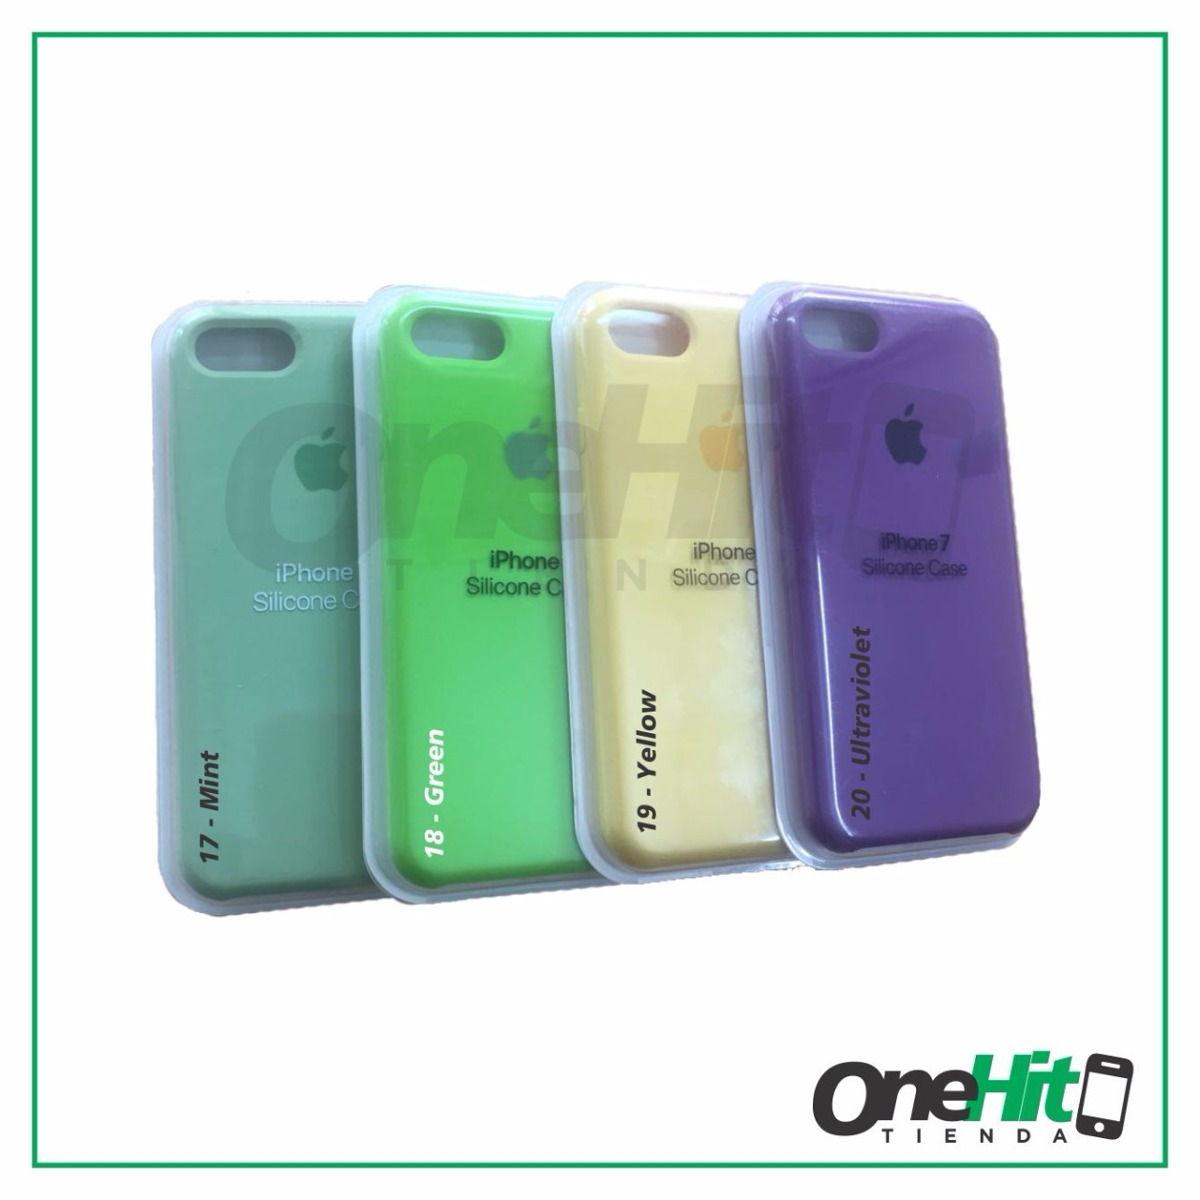 04da9f64e10 funda iphone® silicone case 5s se 6 6s 7 8 plus original. Cargando zoom.